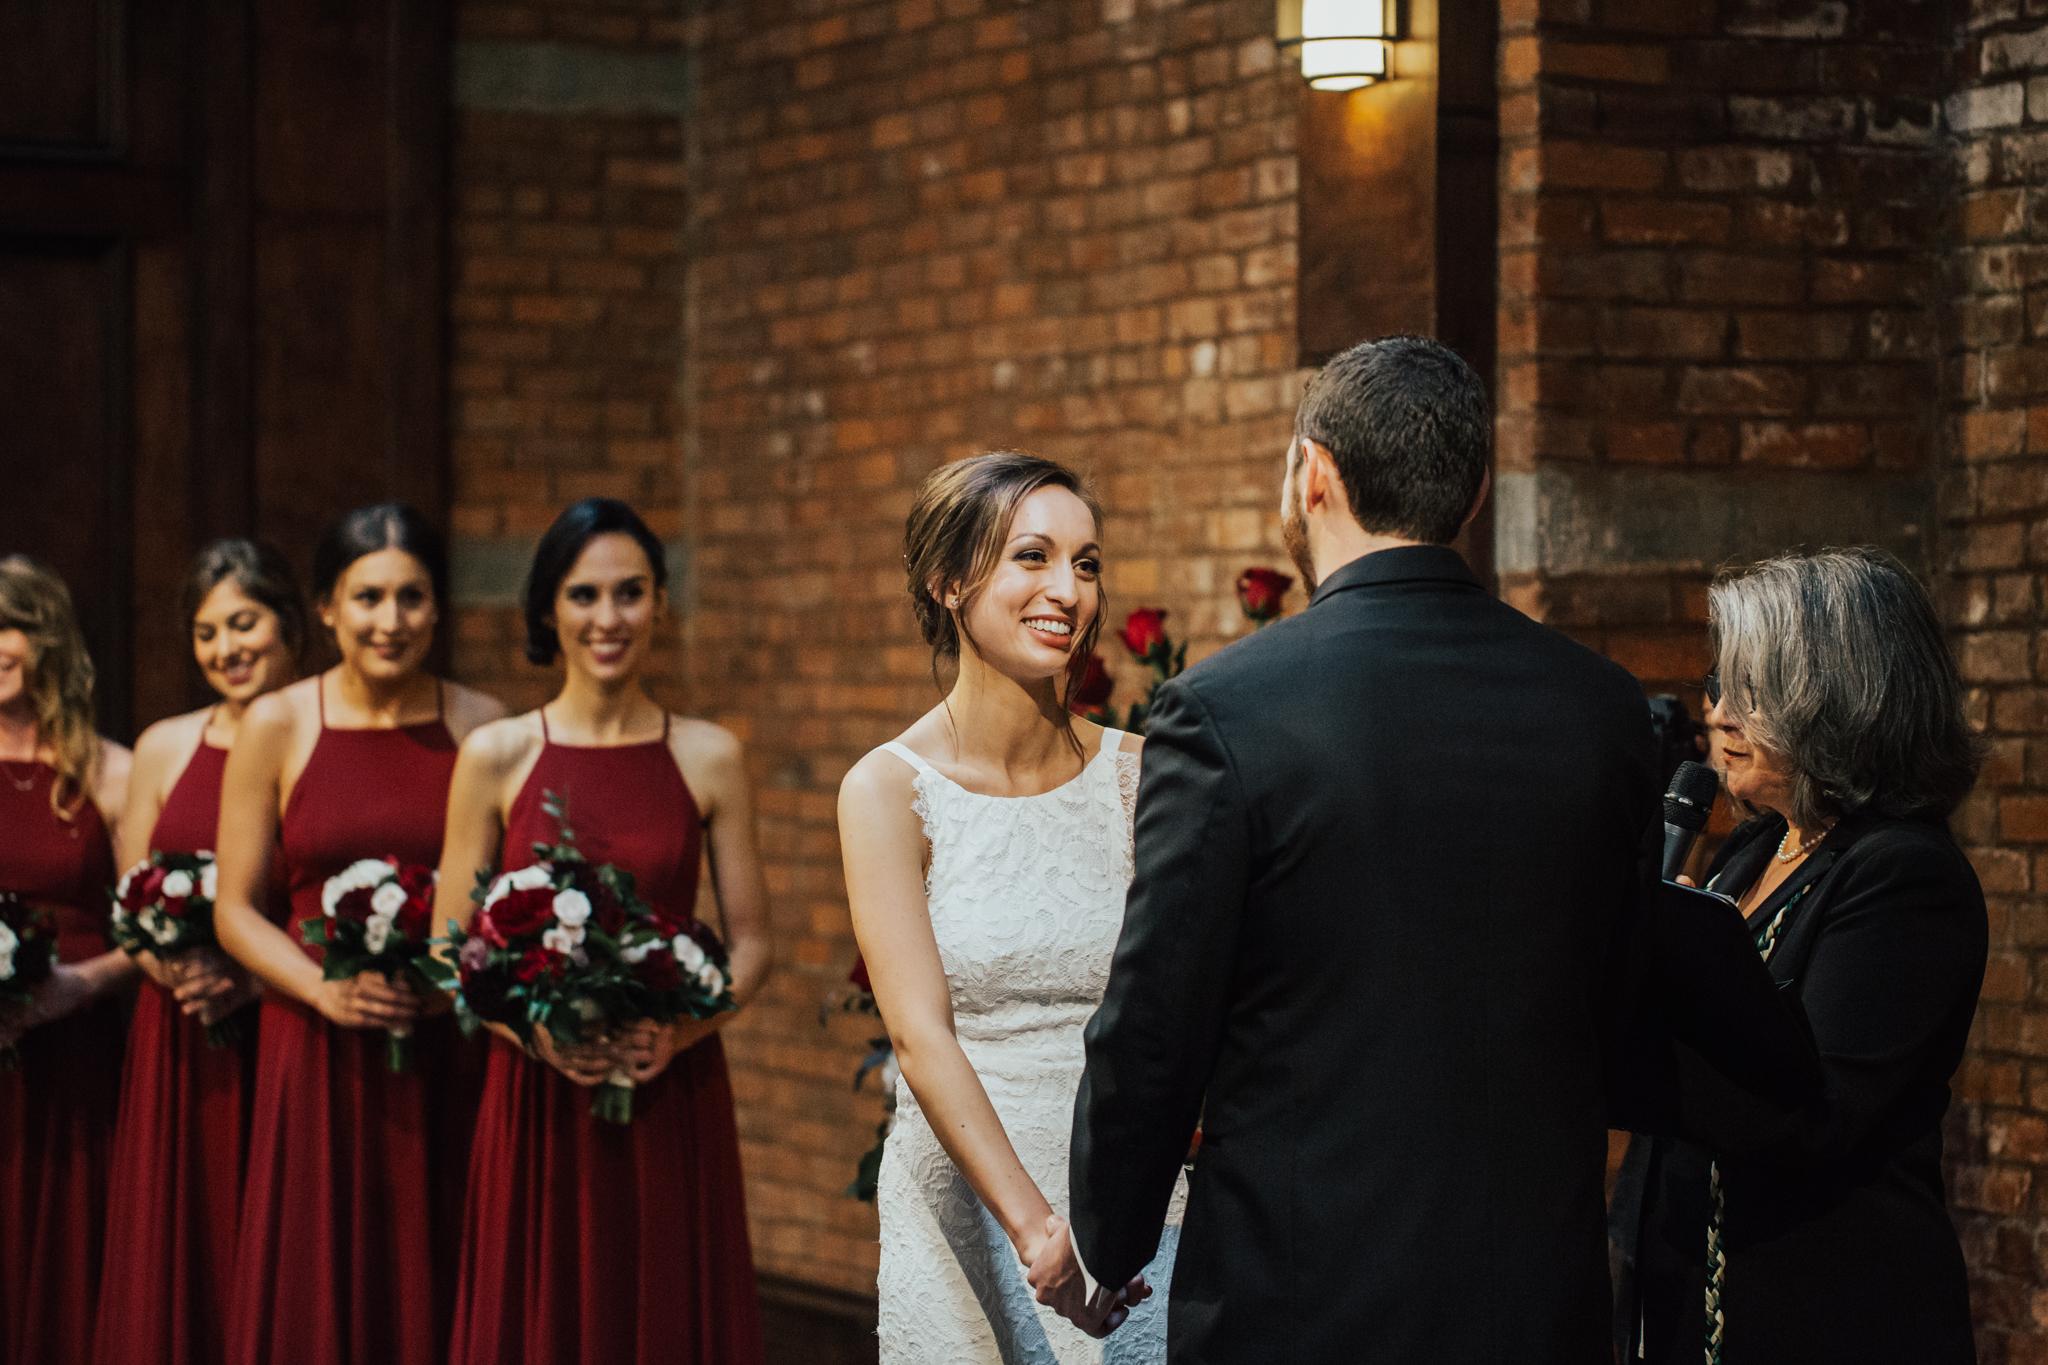 26-bridge-wedding-brooklyn-042.JPG